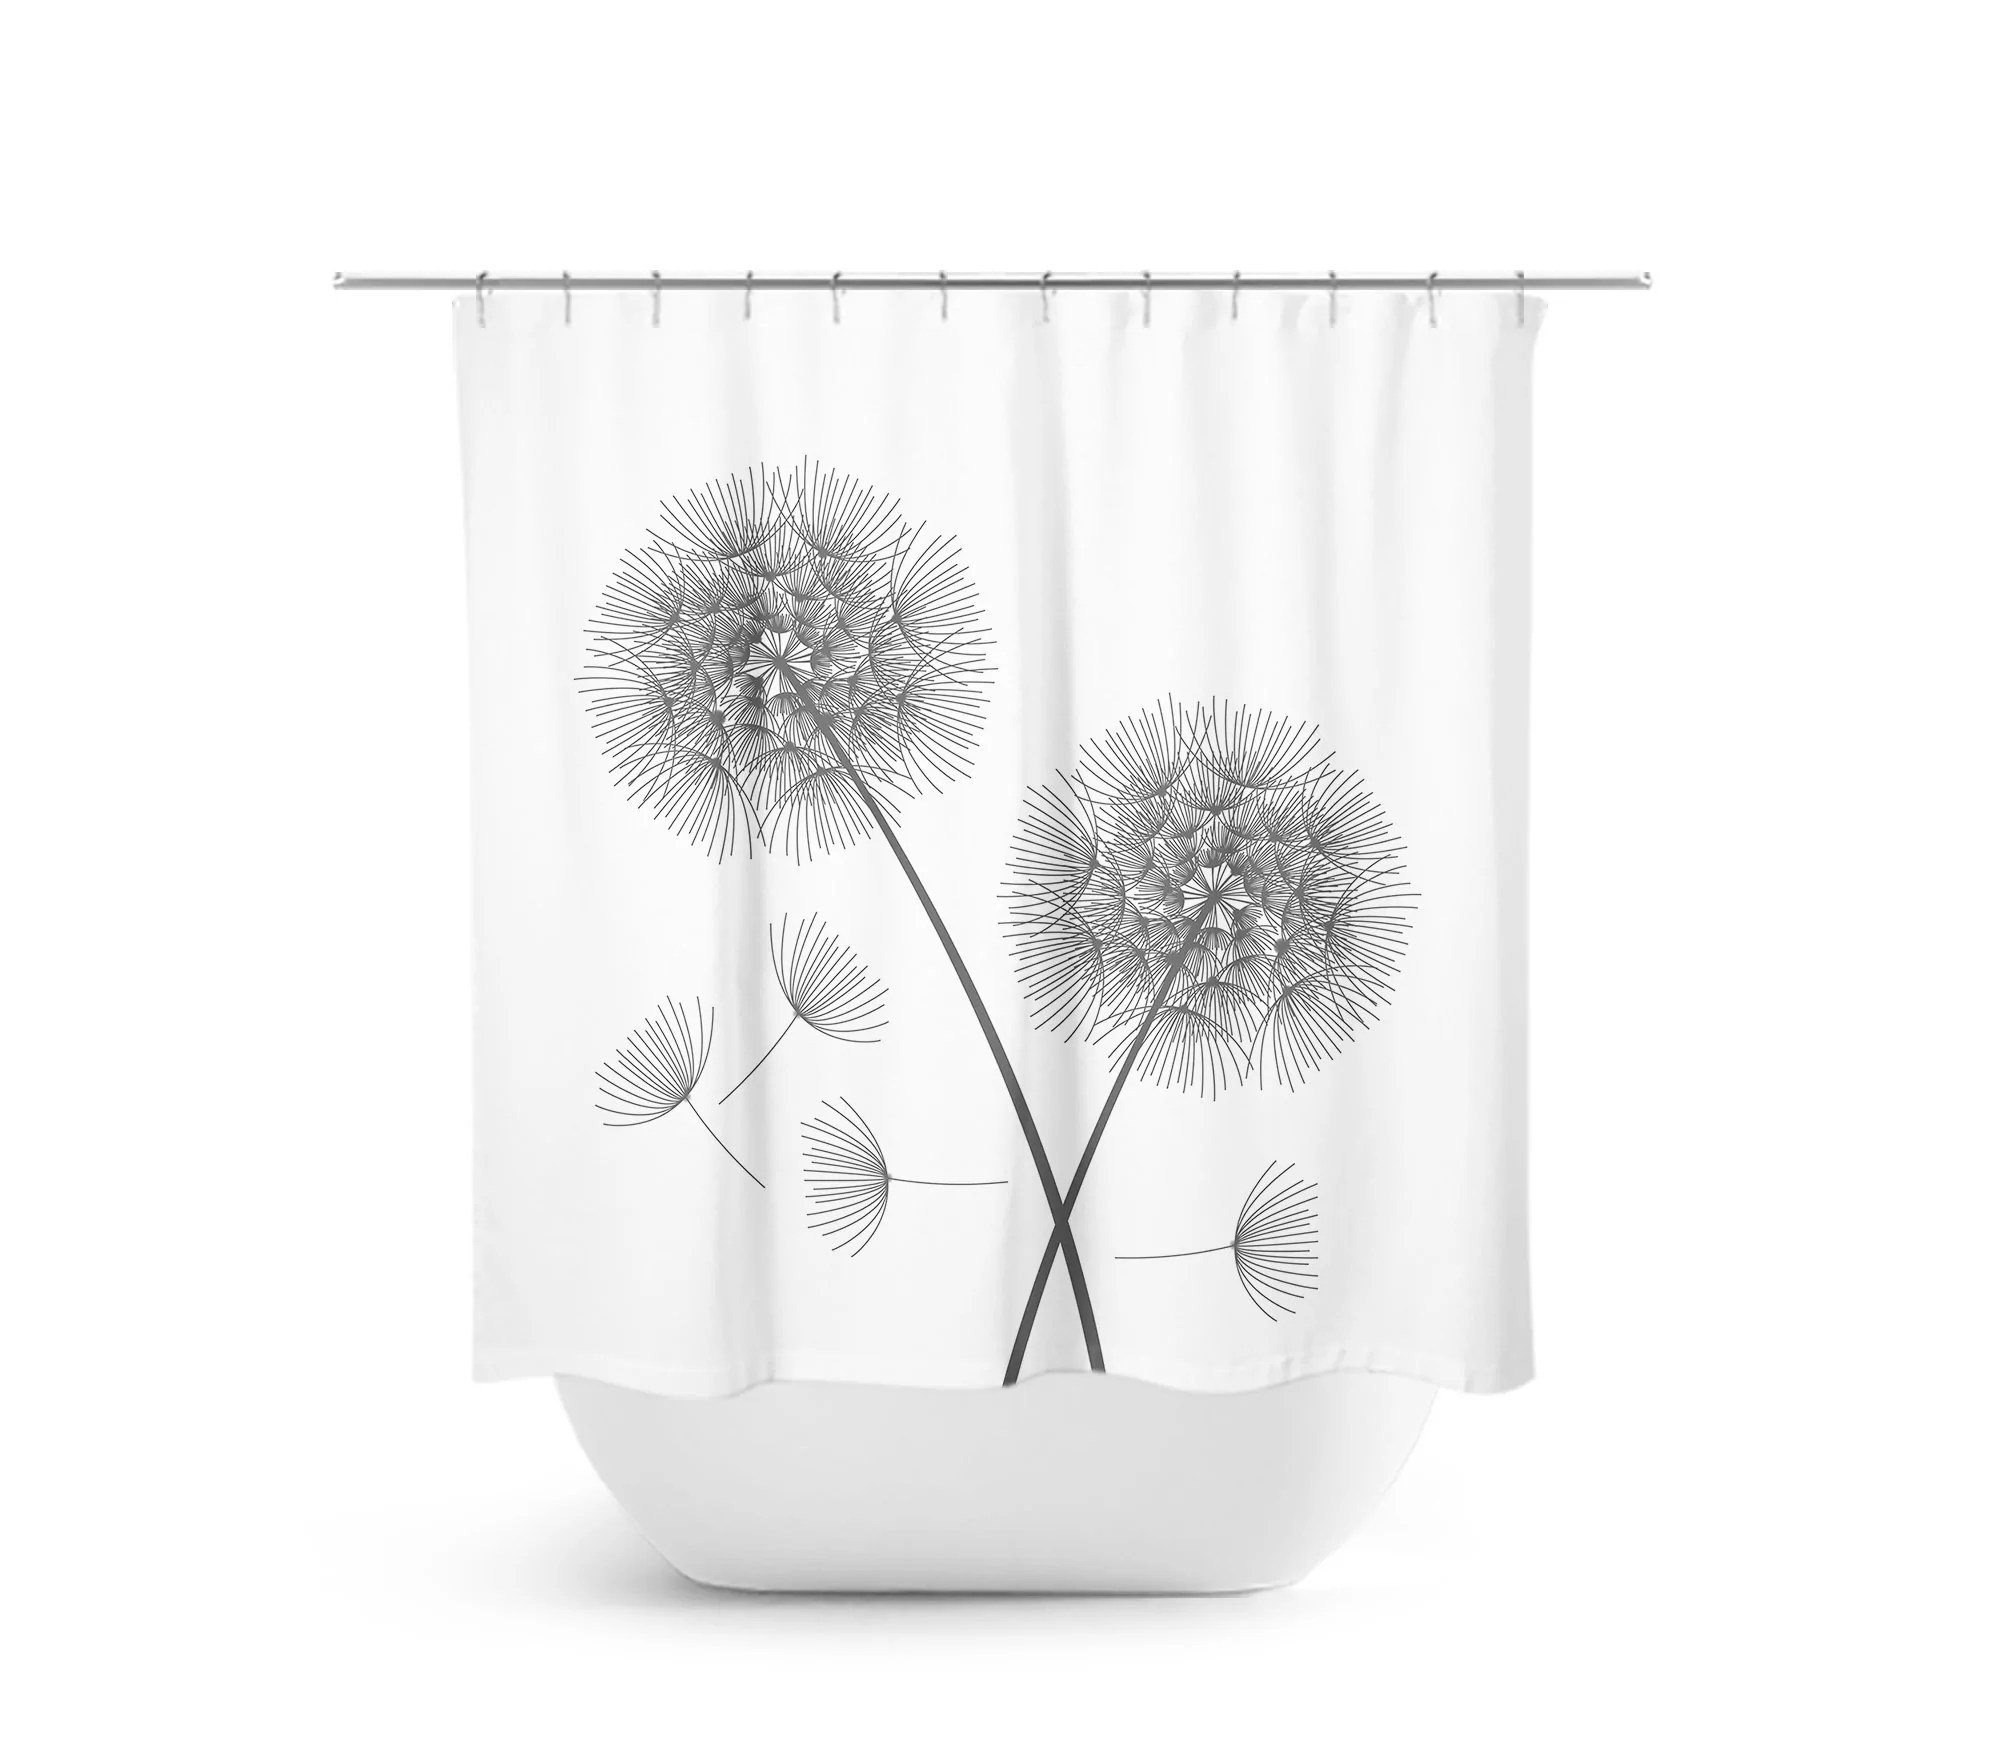 minimalist white gray dandelion fabric shower curtain shower54